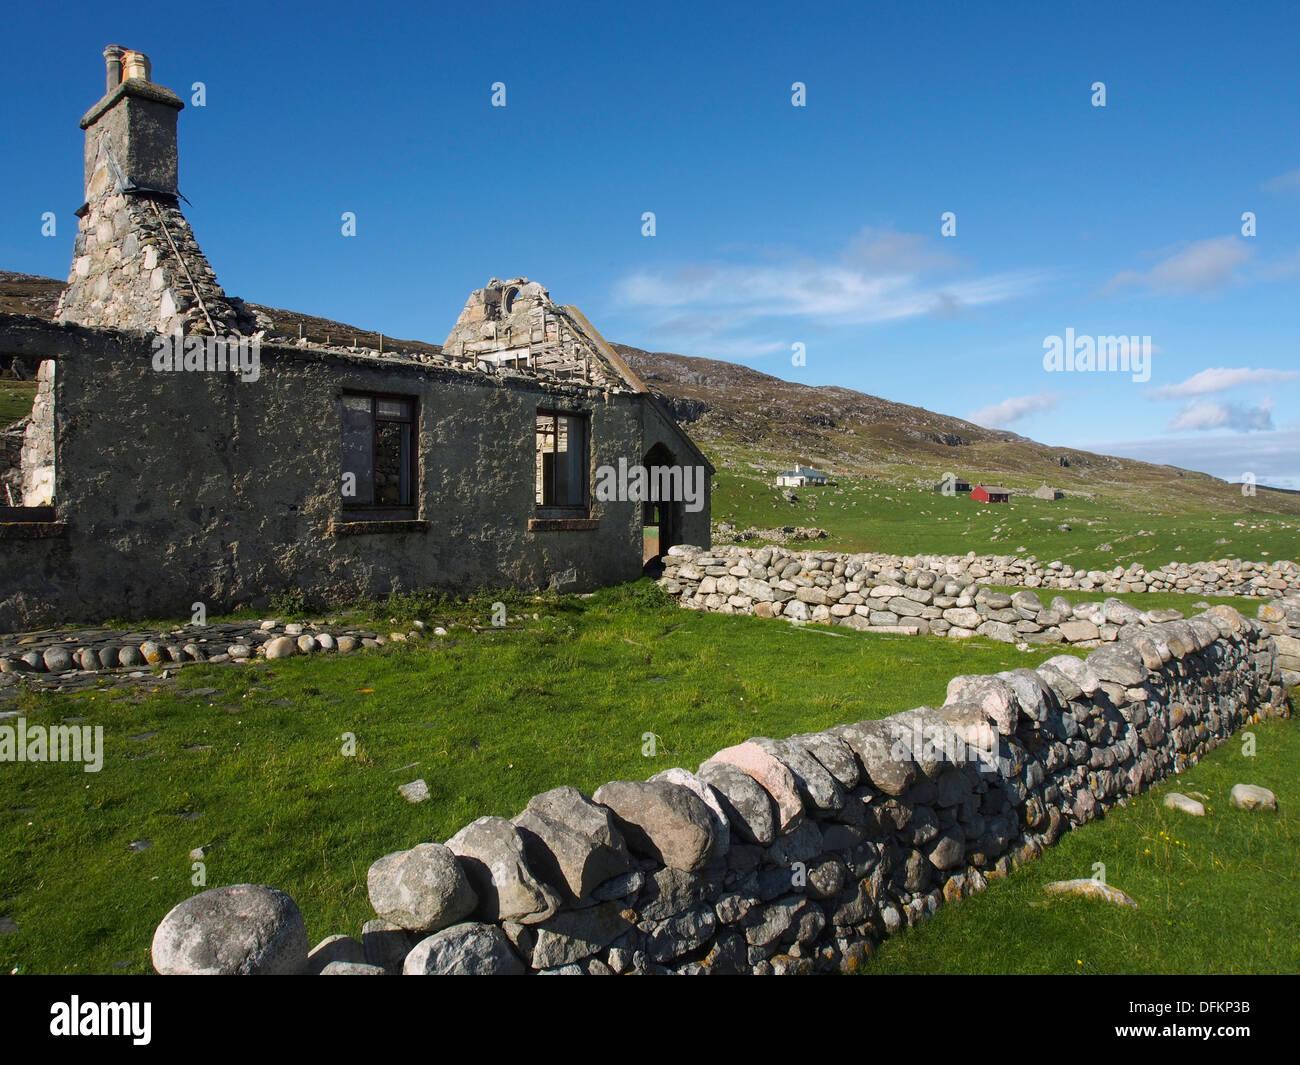 Ruined house on Scarp, Scotland - Stock Image